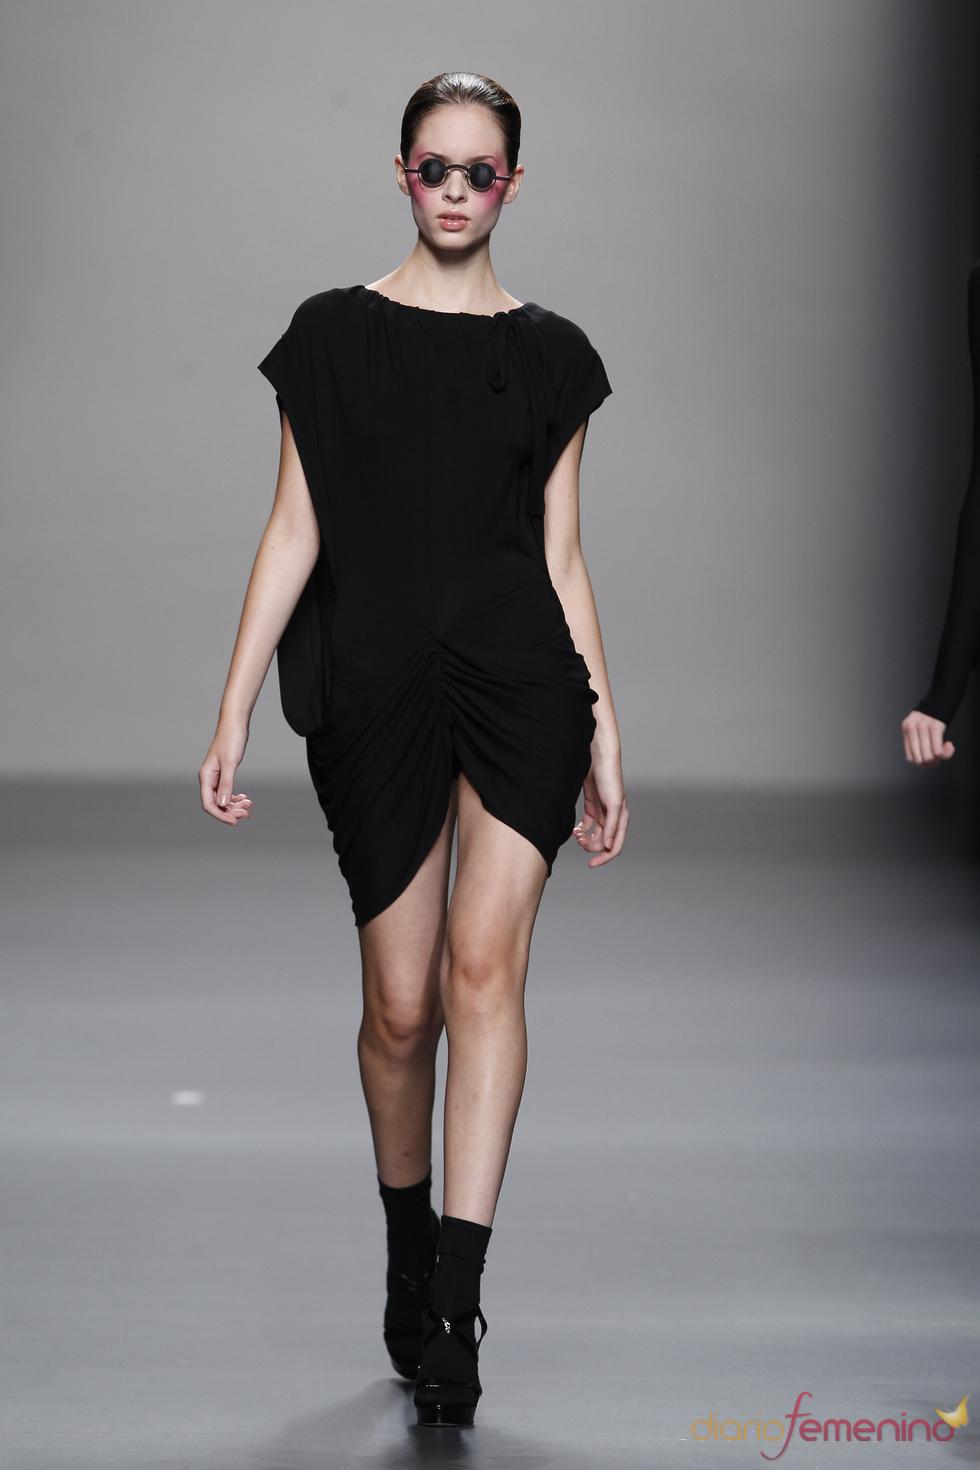 Little black dress con apertura frontal de Lydia Delgado en Cibeles 2011